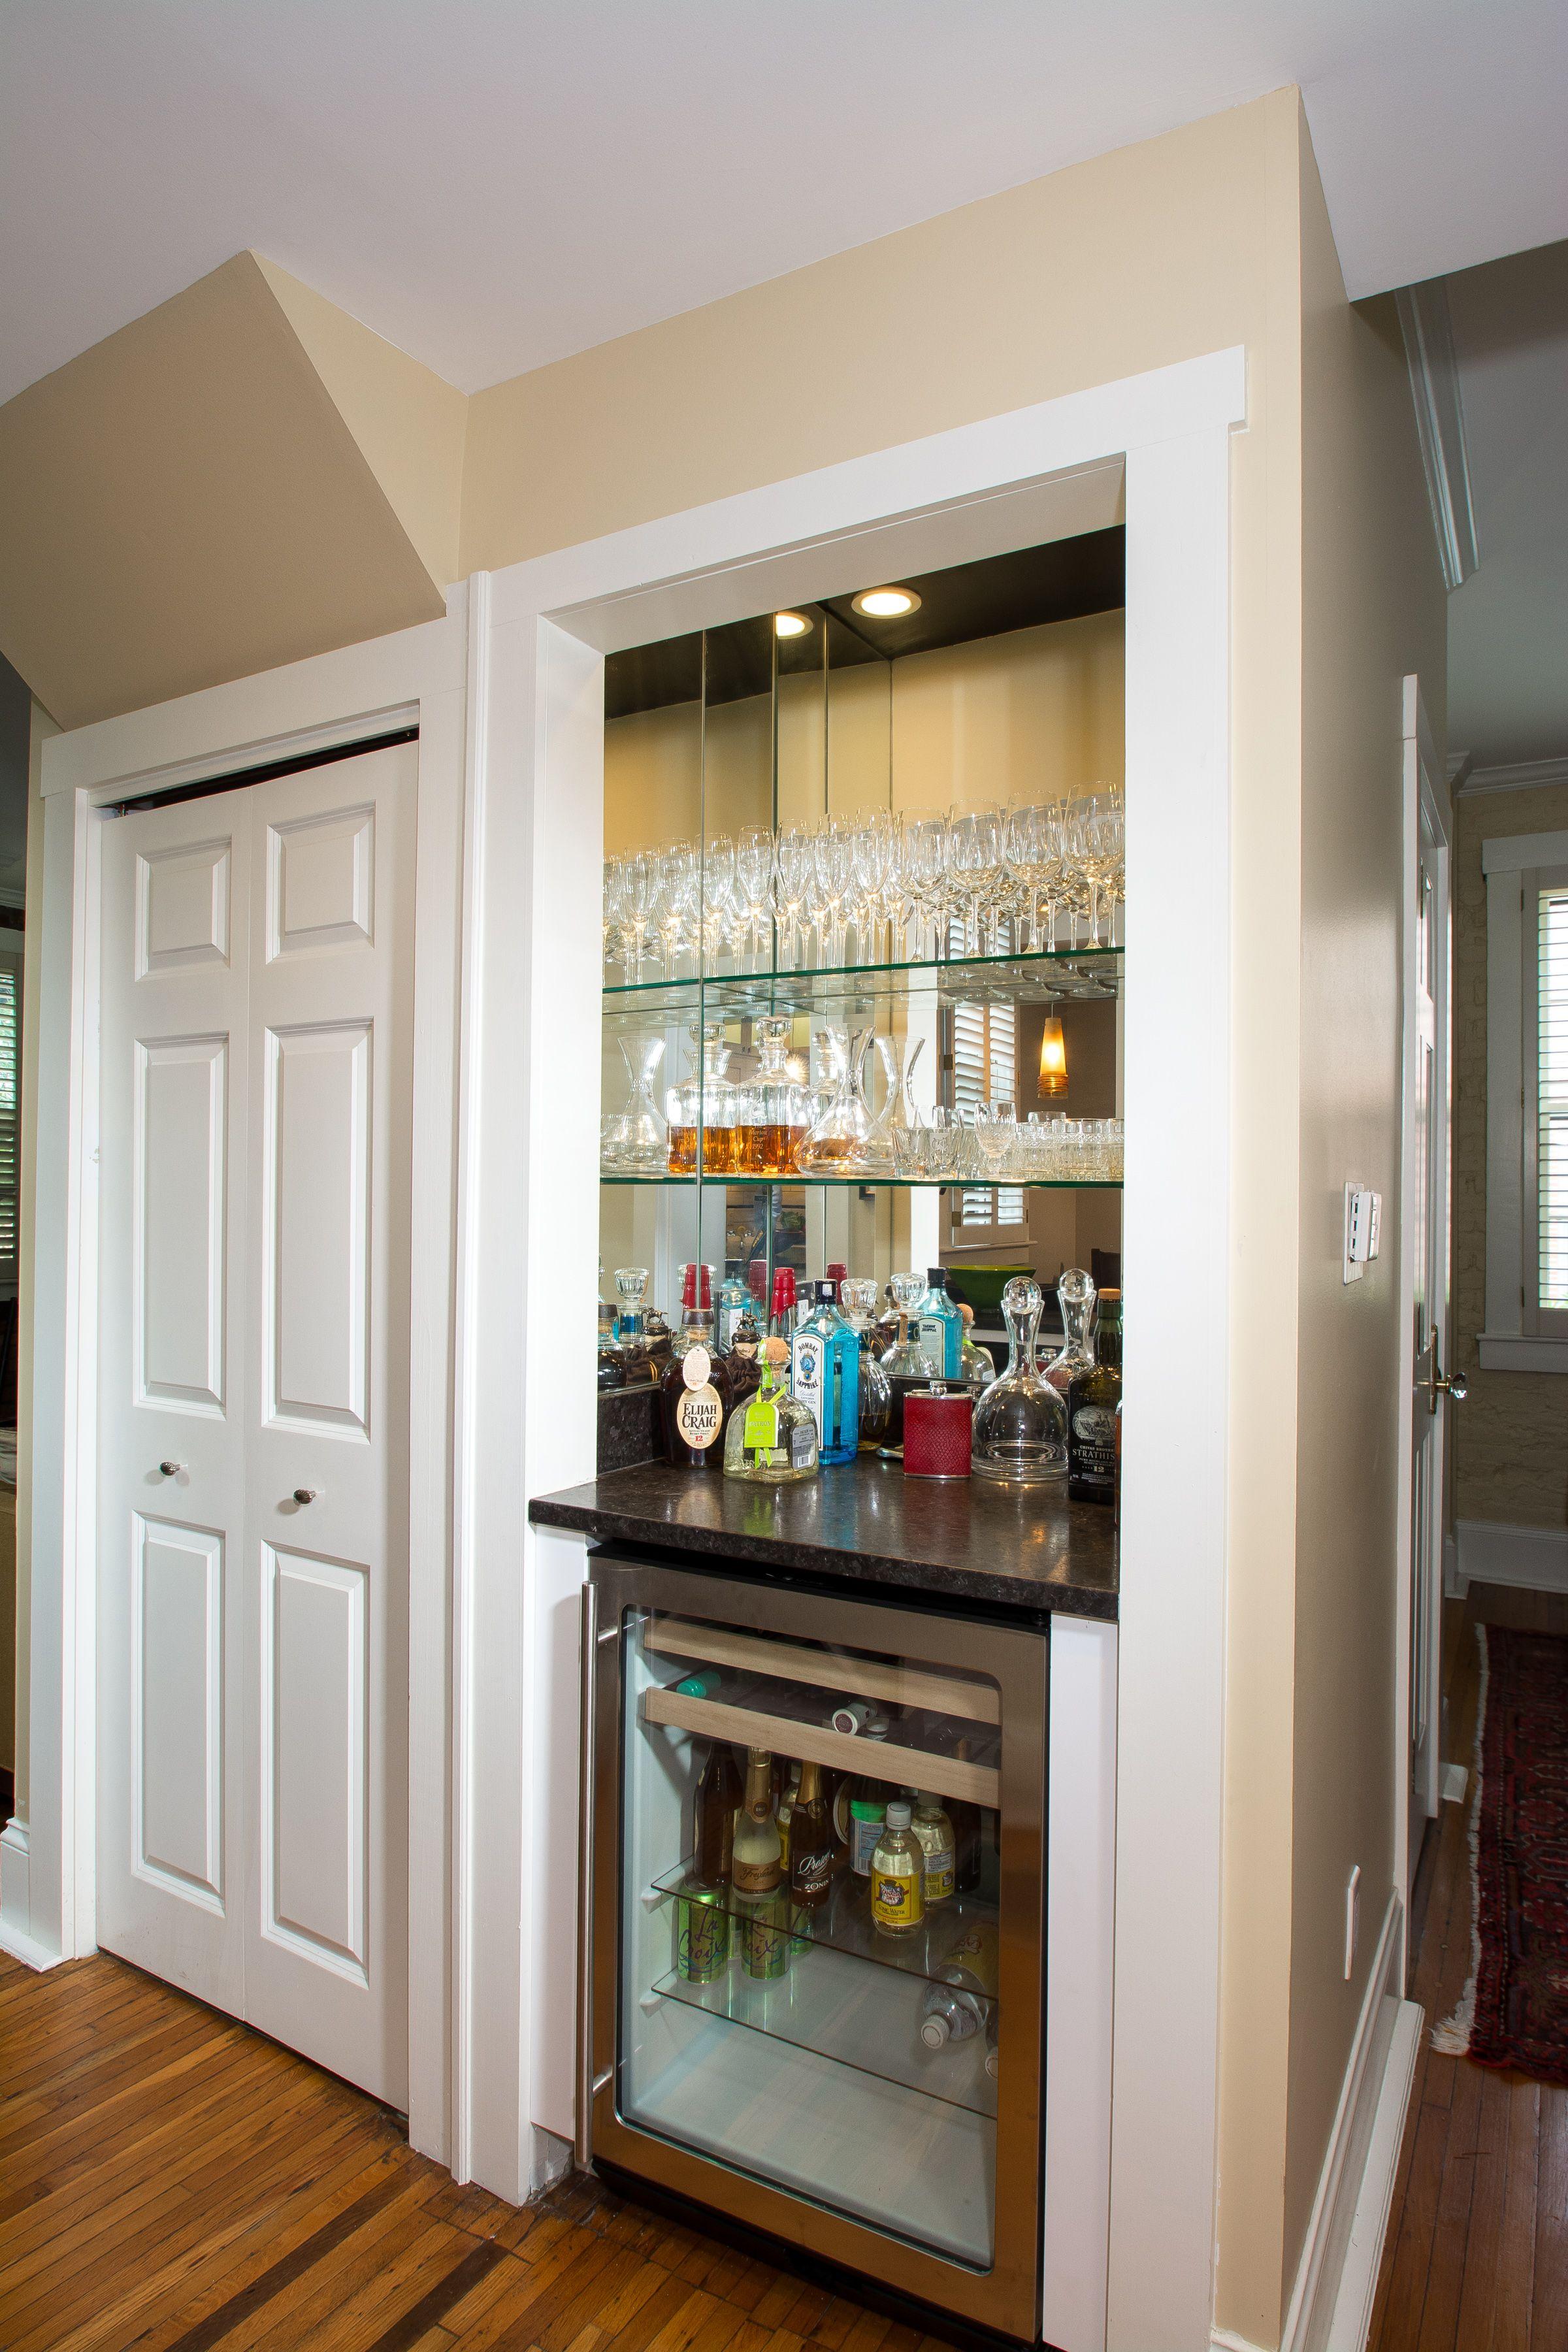 Converted Closet to Wine Bar